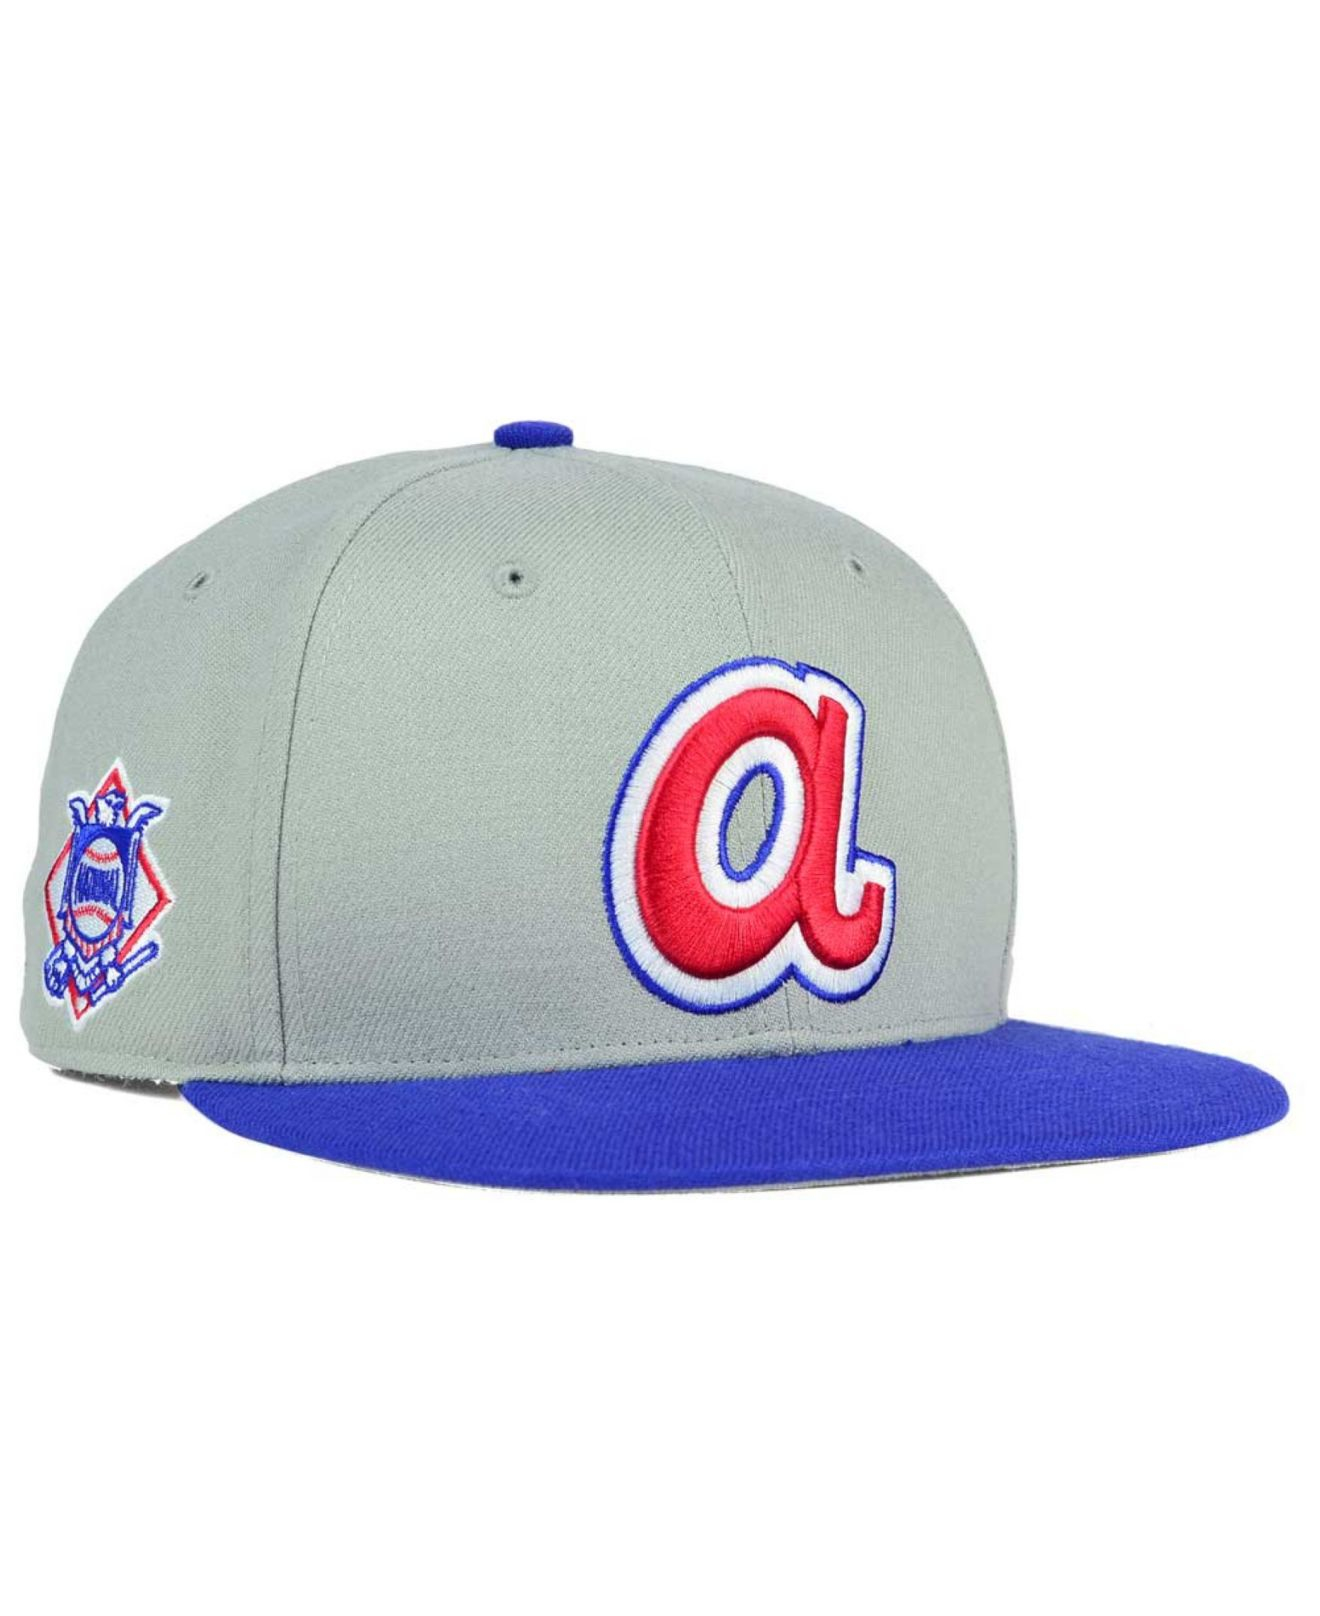 b7d376a095f best price royalblue white blue atlanta braves new era 47 mlb mountain franchise  cap 24cc5 470a1